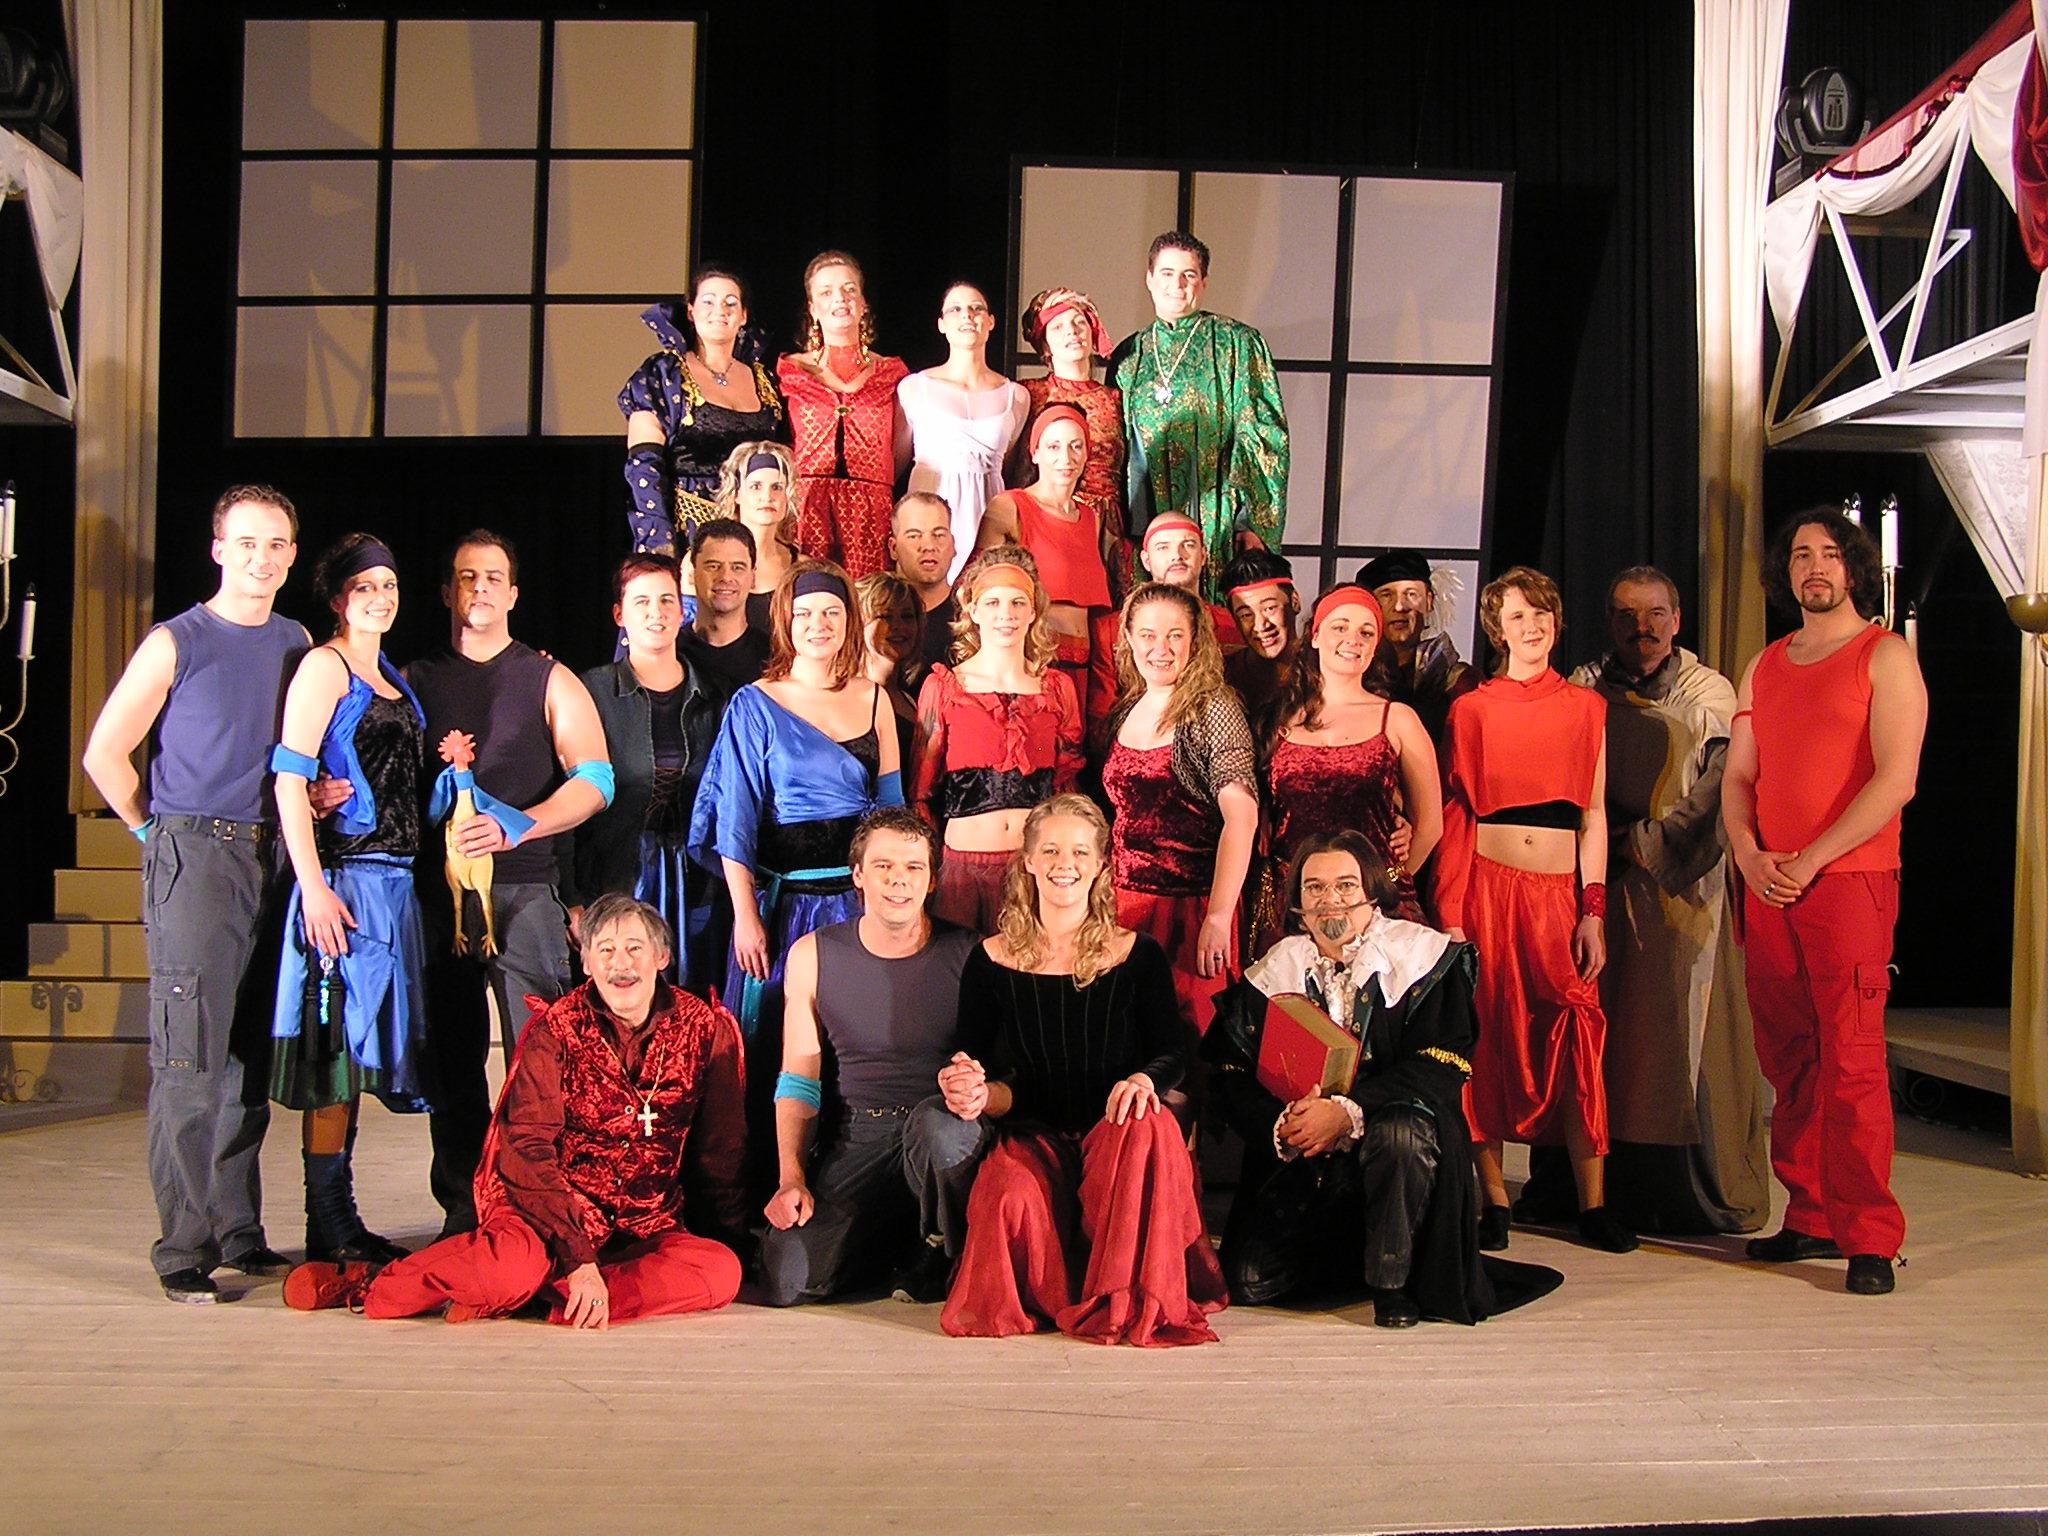 2006 Romeo und Julia